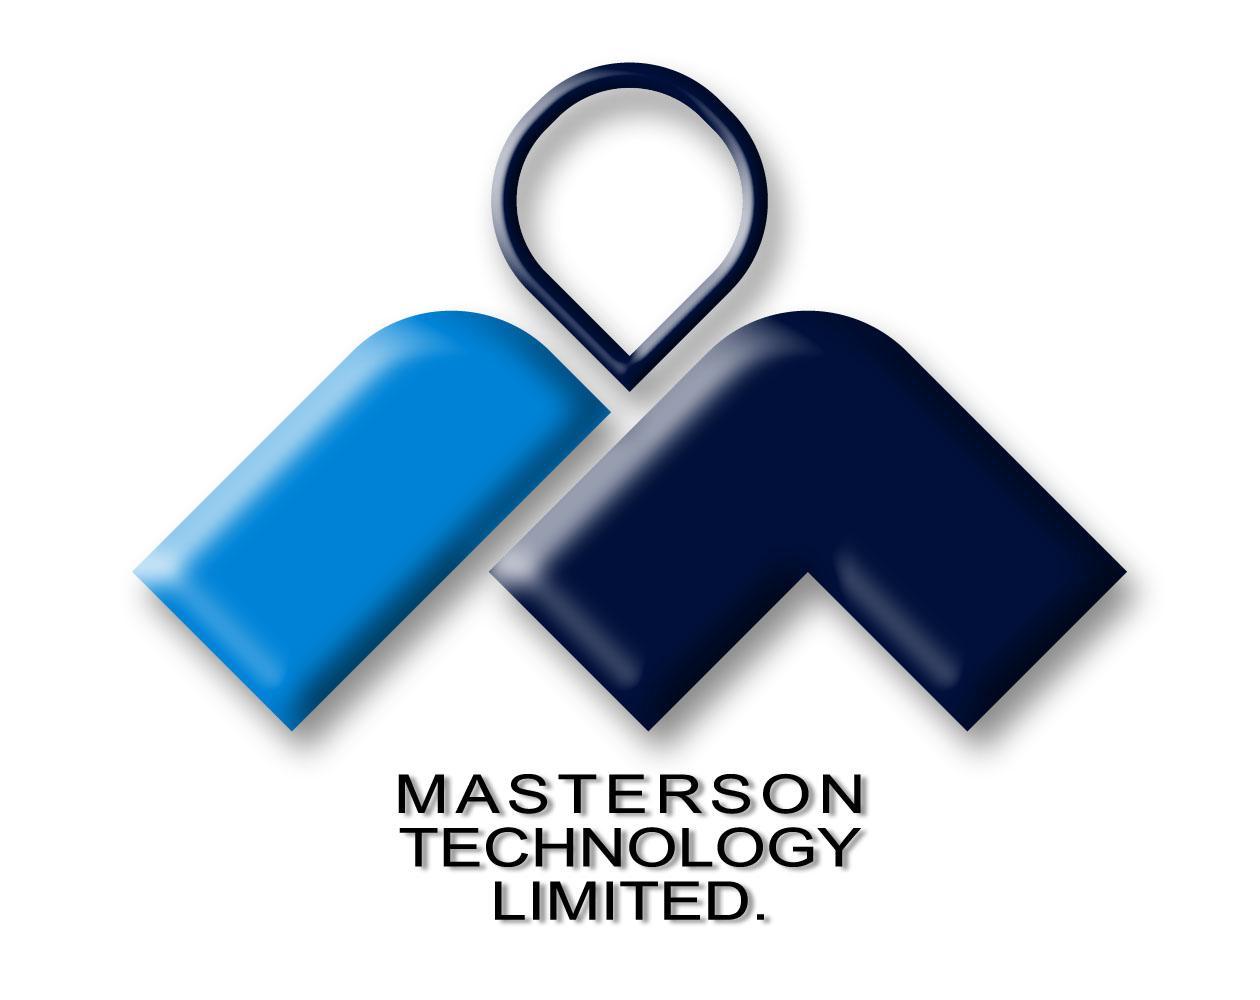 Masterson Technology Ltd